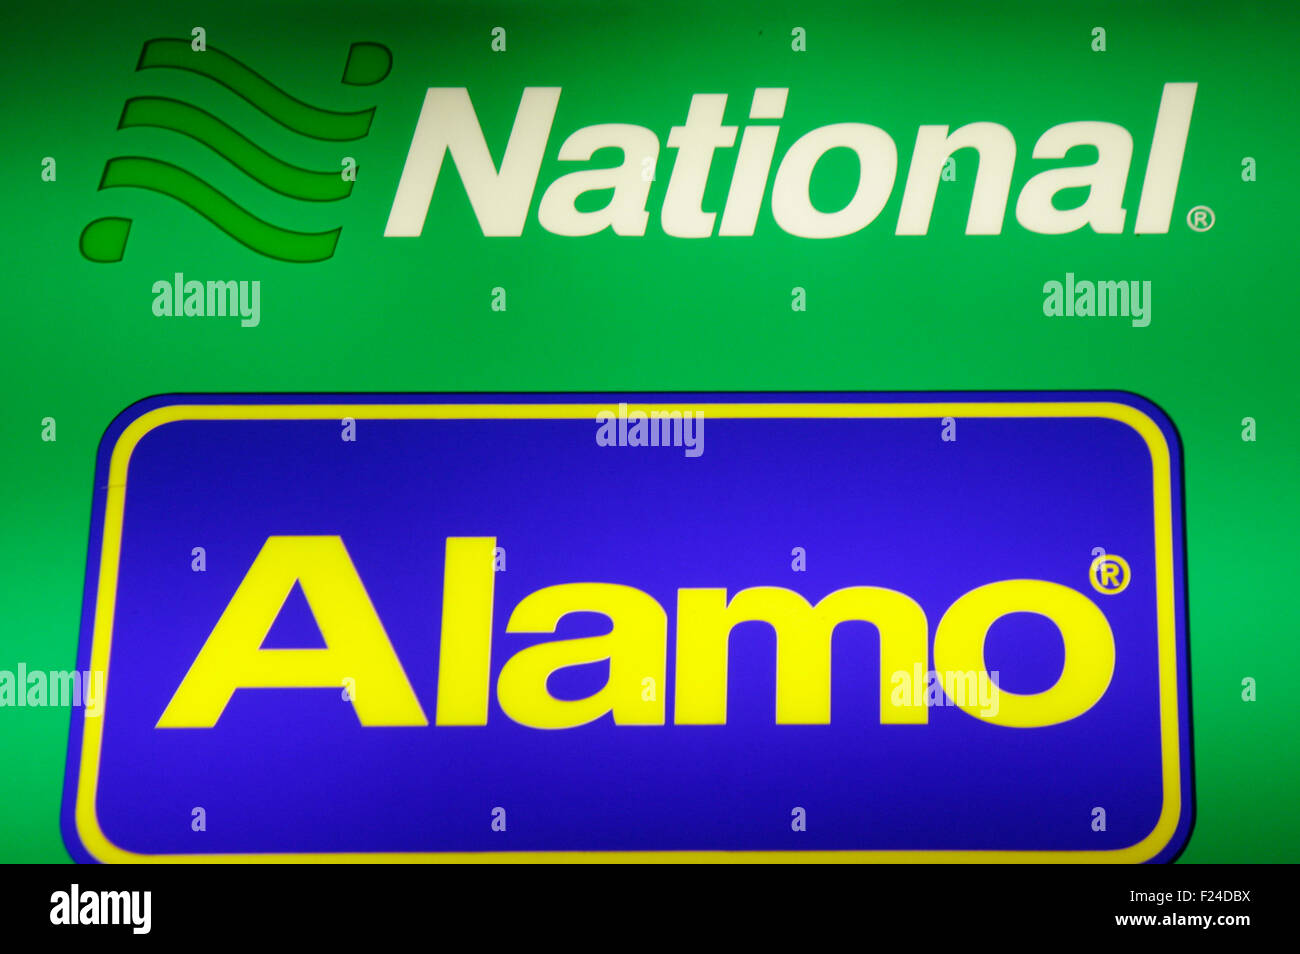 Markenname: 'National' / 'Alamo', Dezember 2013, Berlin. - Stock Image